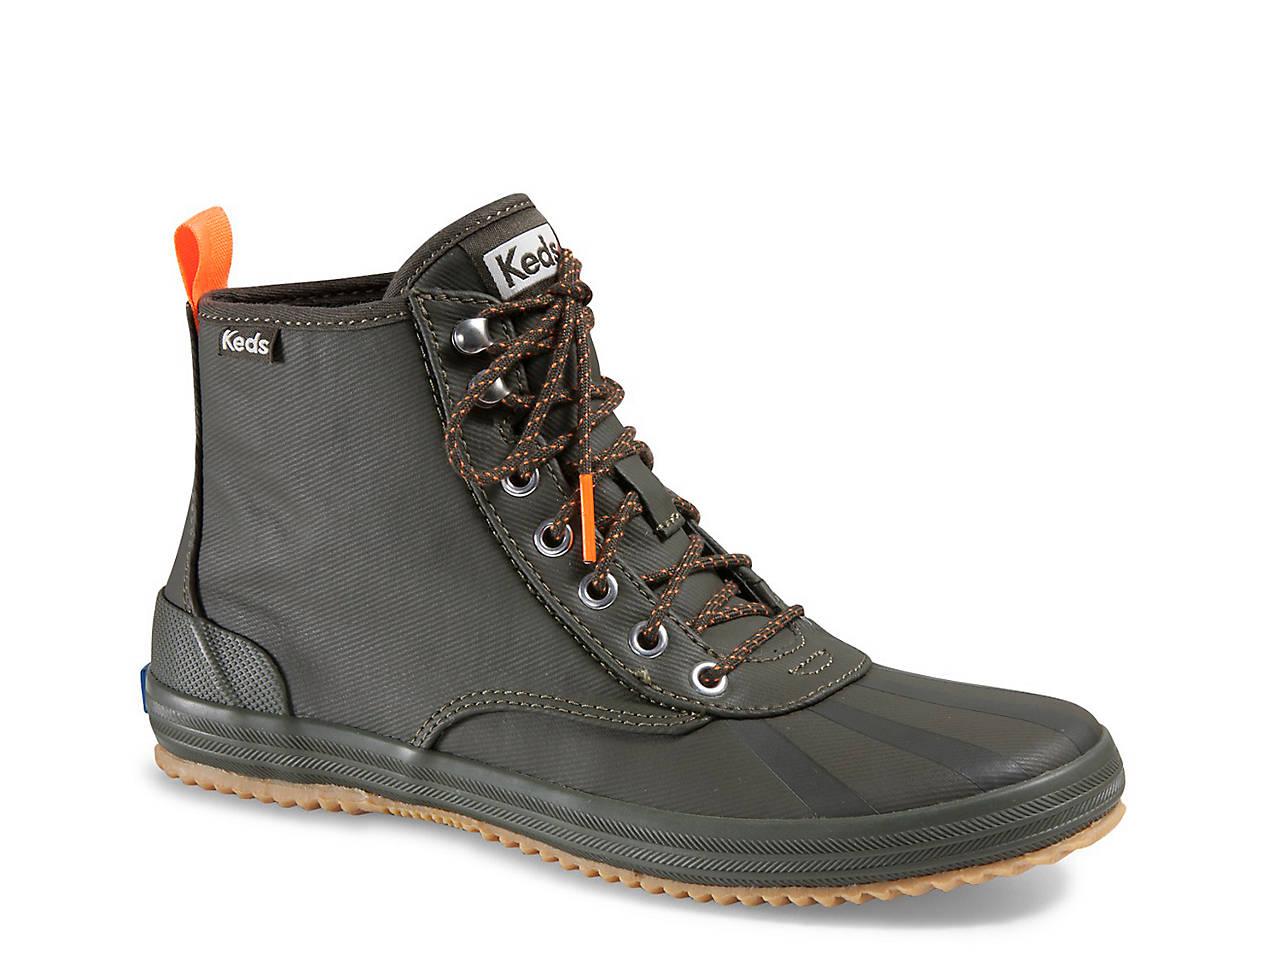 5c94ffbfe194 Keds Scout Splash Rain Boot - Women s Women s Shoes